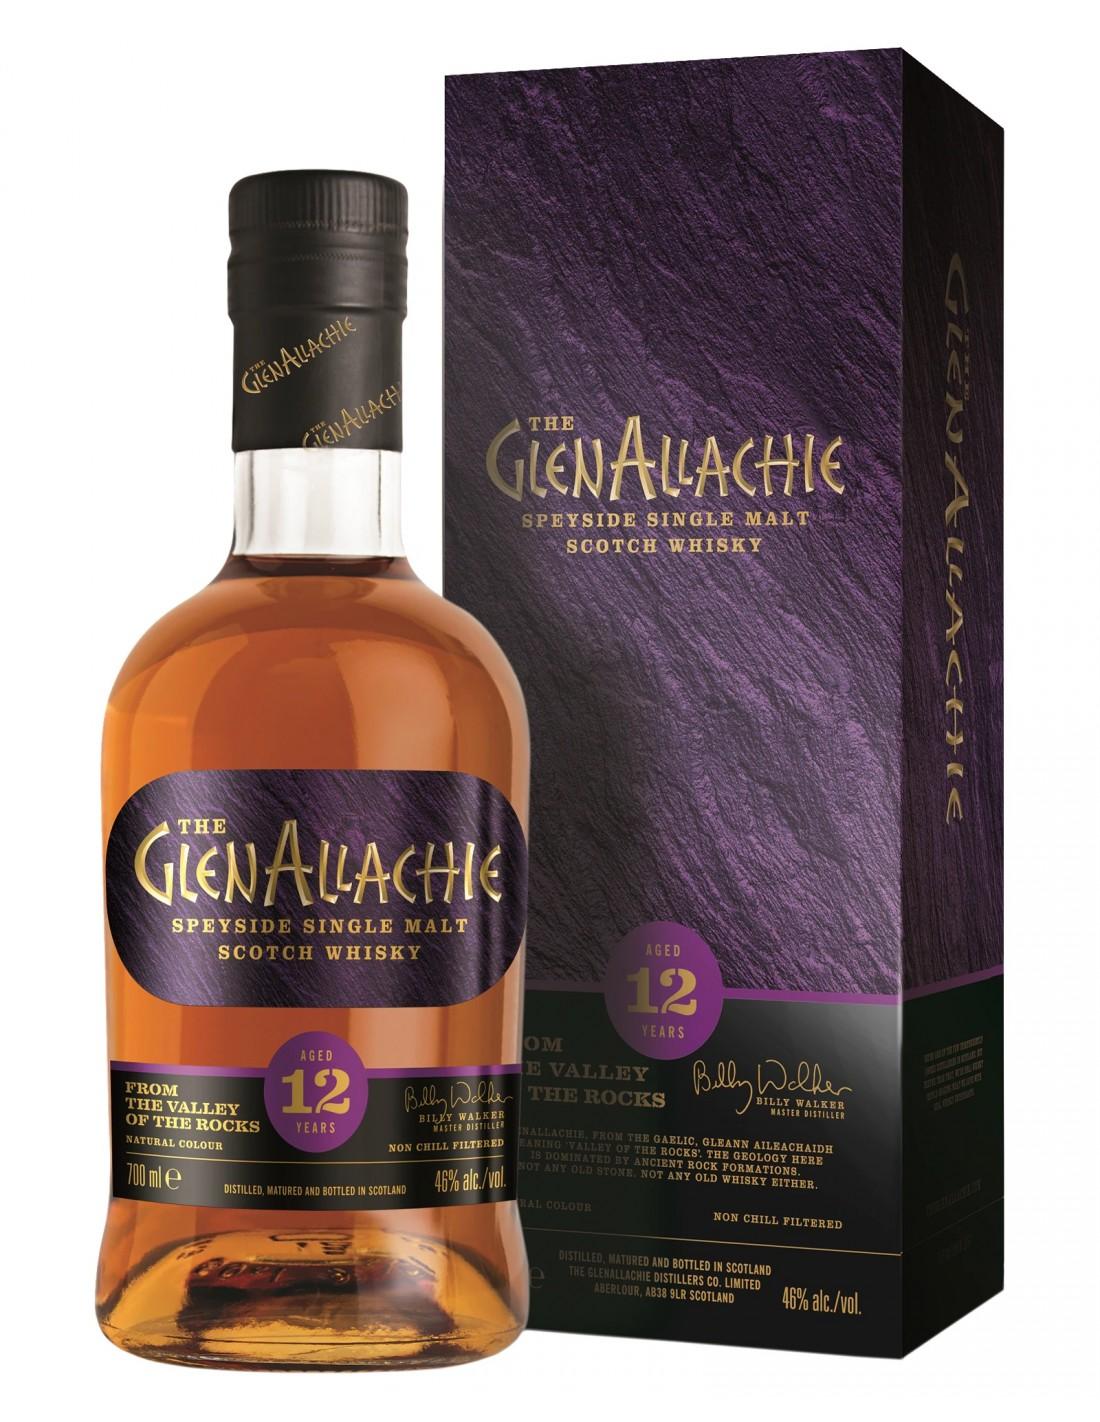 Whisky GlenAllachie Single Malt 0.7L, 46% alc.